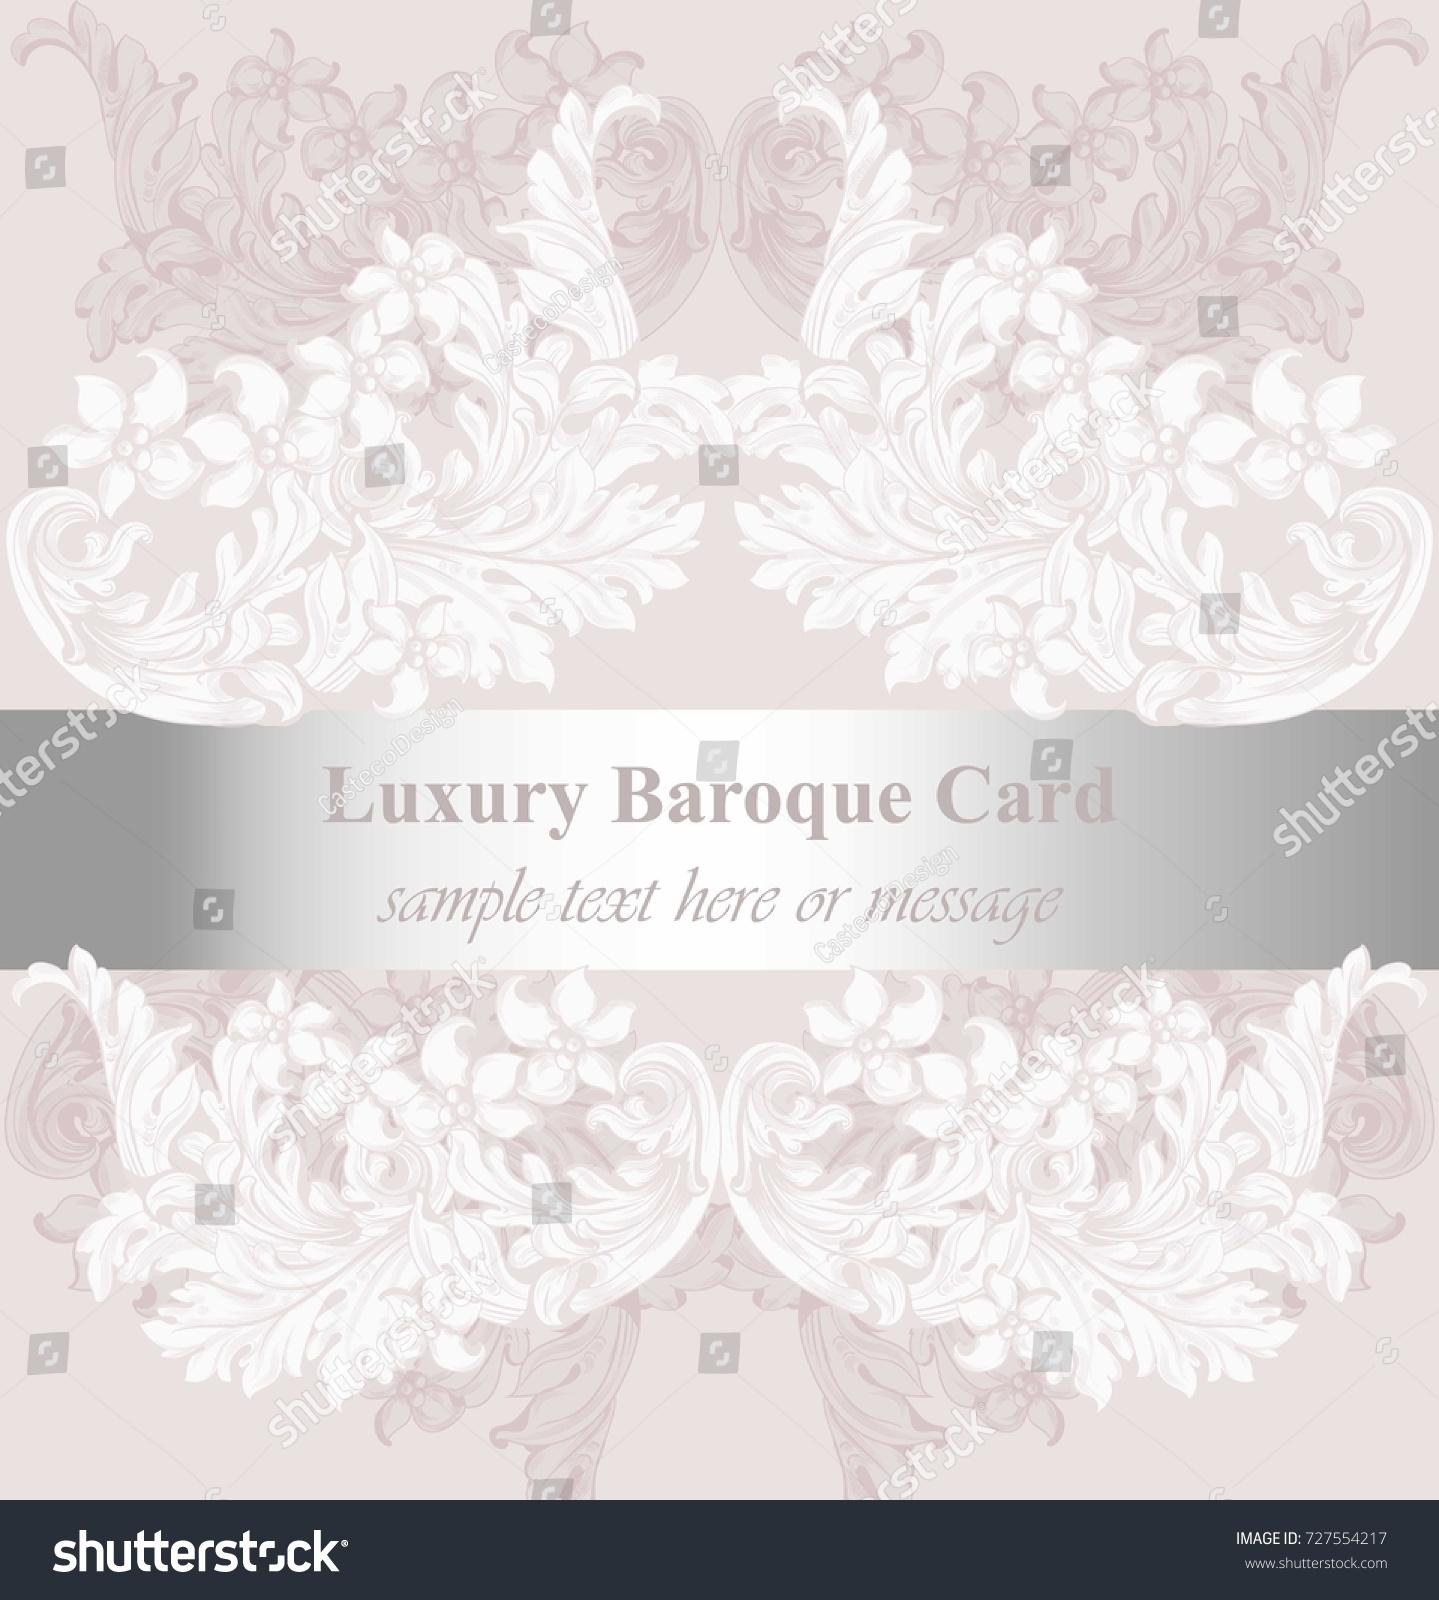 Luxury invitation card vector royal victorian stock vector 727554217 luxury invitation card vector royal victorian stock vector 727554217 shutterstock stopboris Images